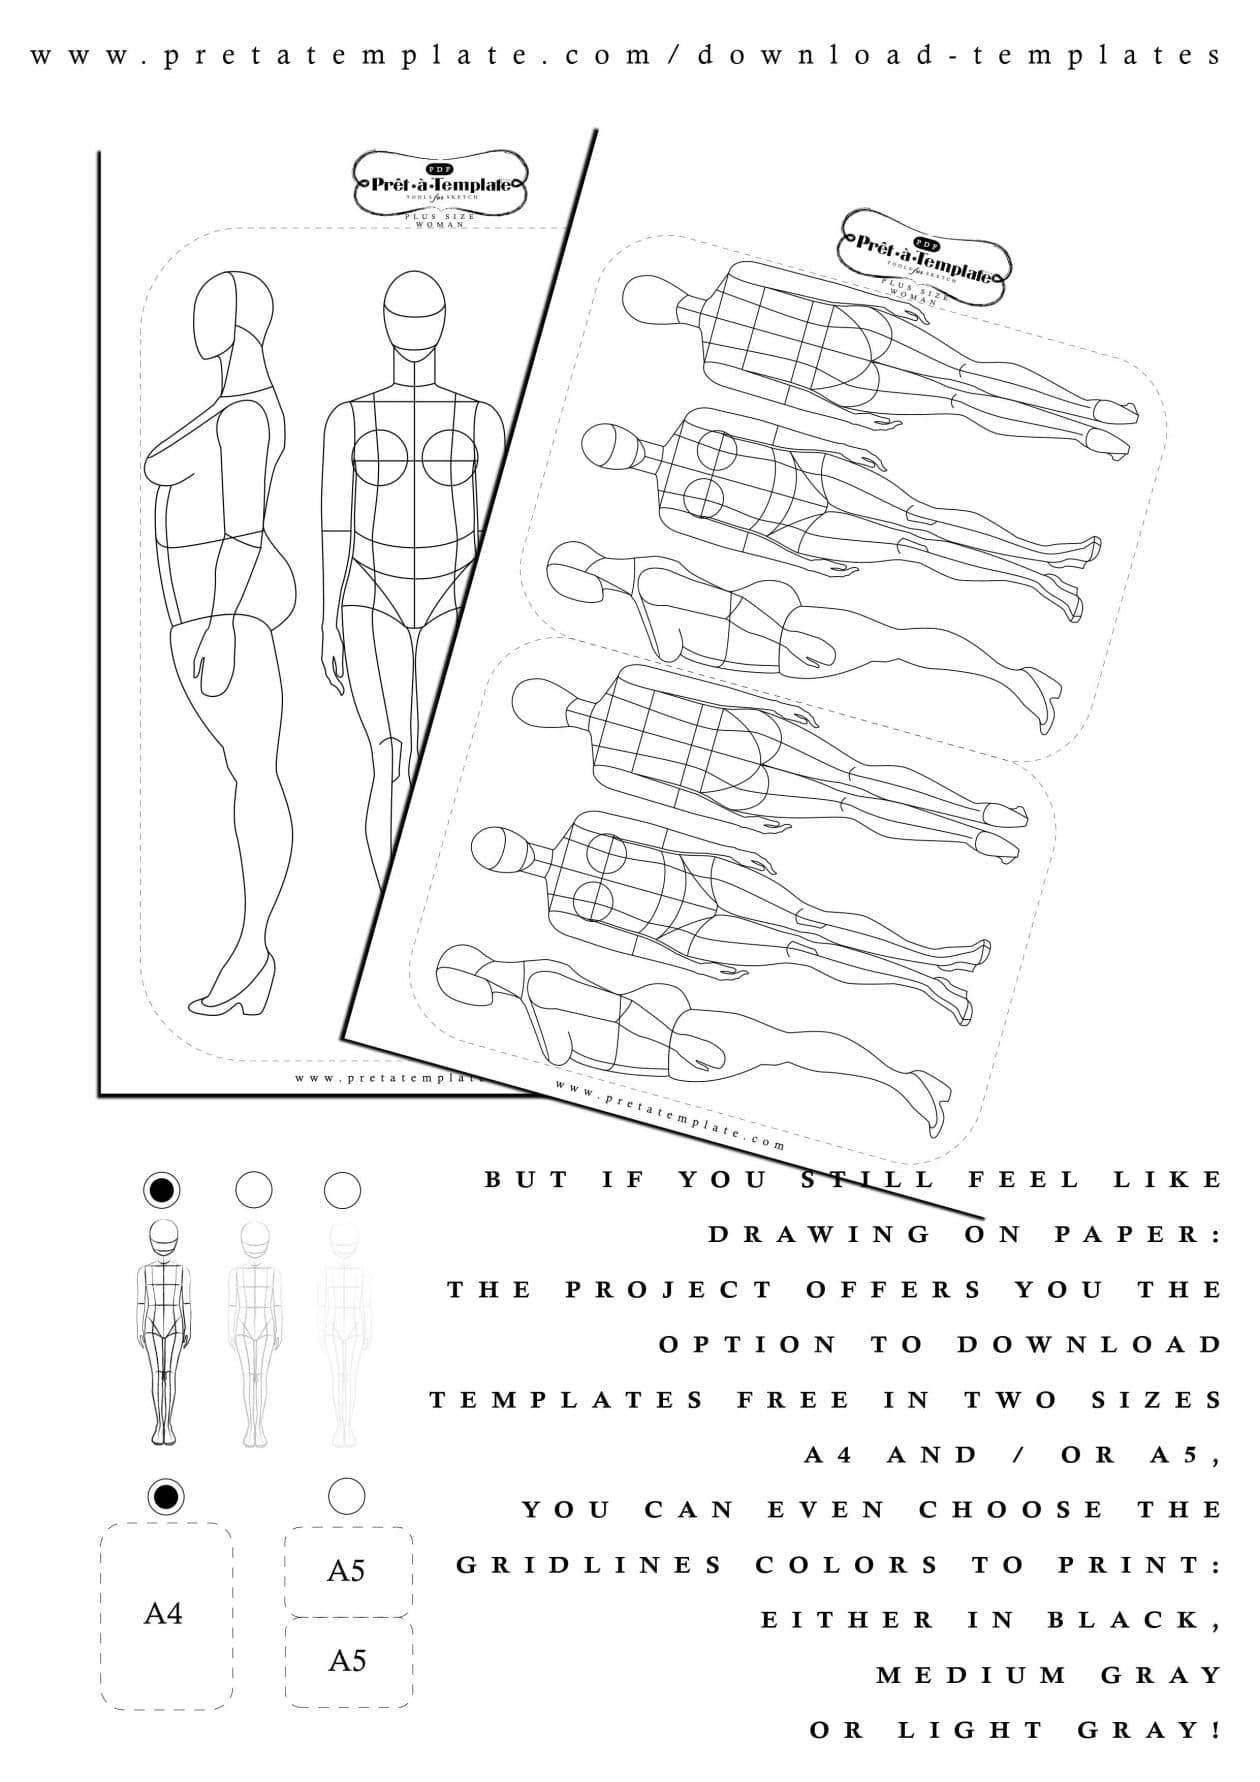 Prêt-à-Template- Your Plus Size Fashion Sketch App  on The Curvy Fashionista